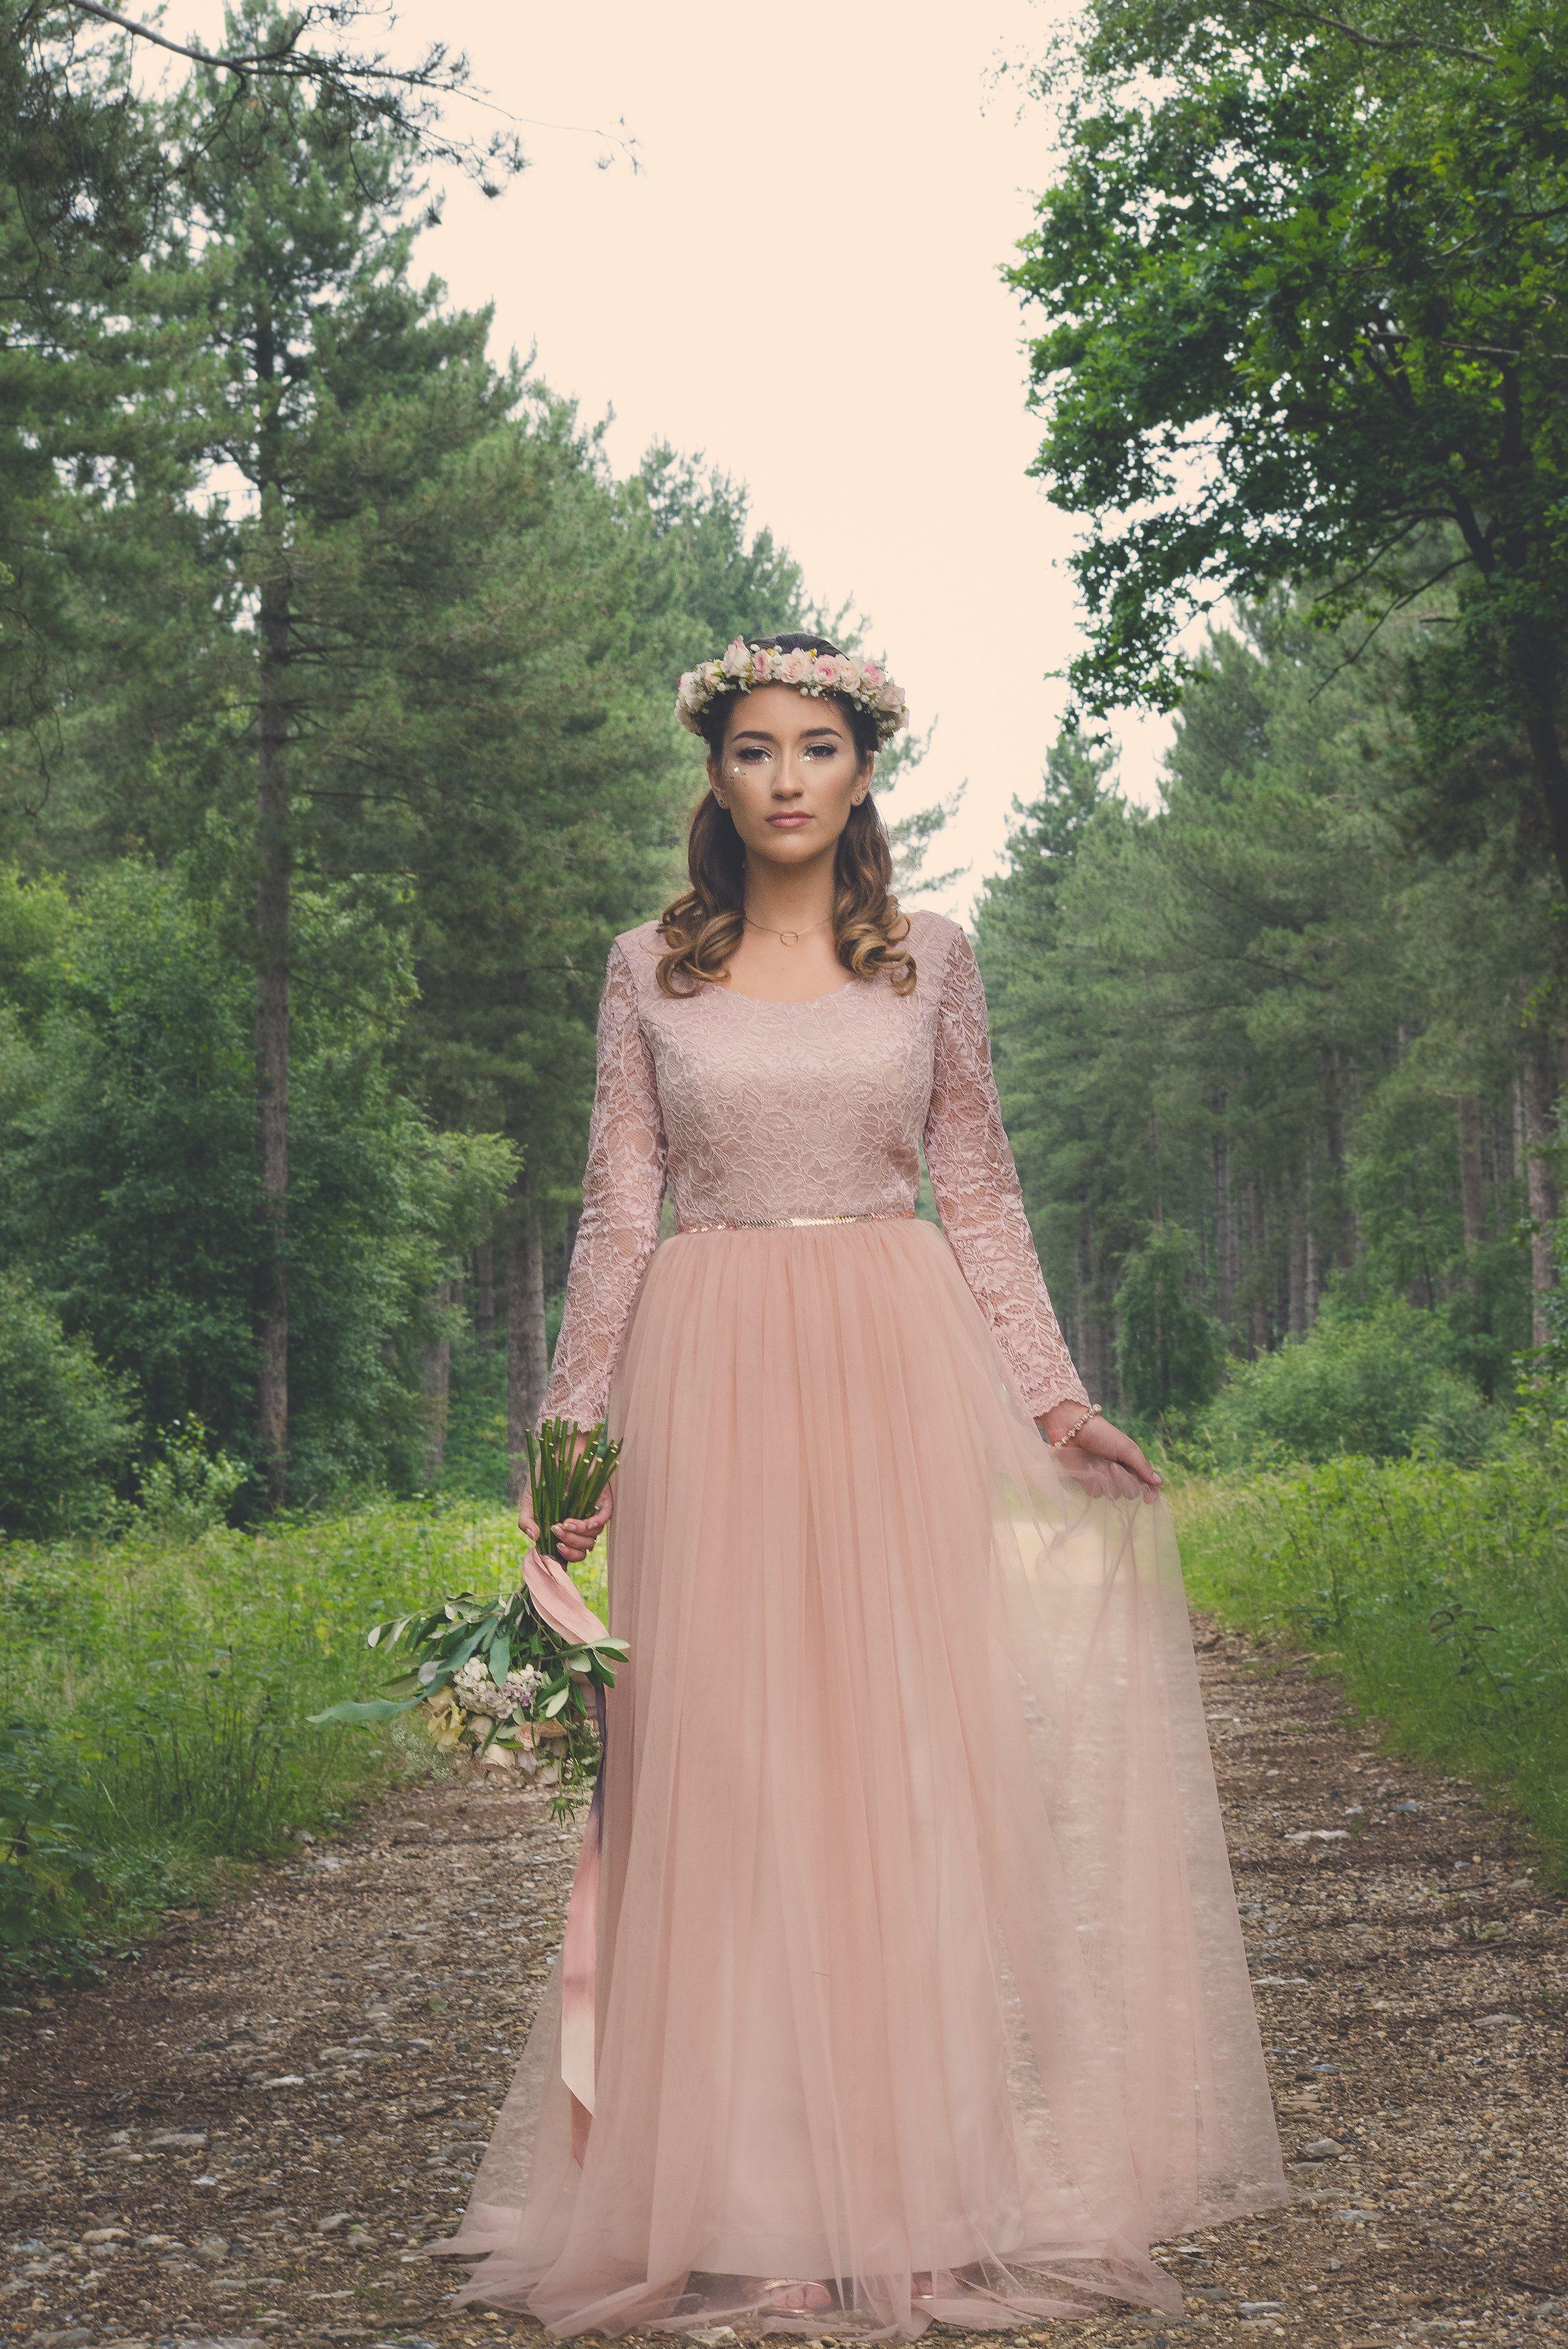 Bespoke wedding/prom dress designed and made by River Elliot Bridal ...